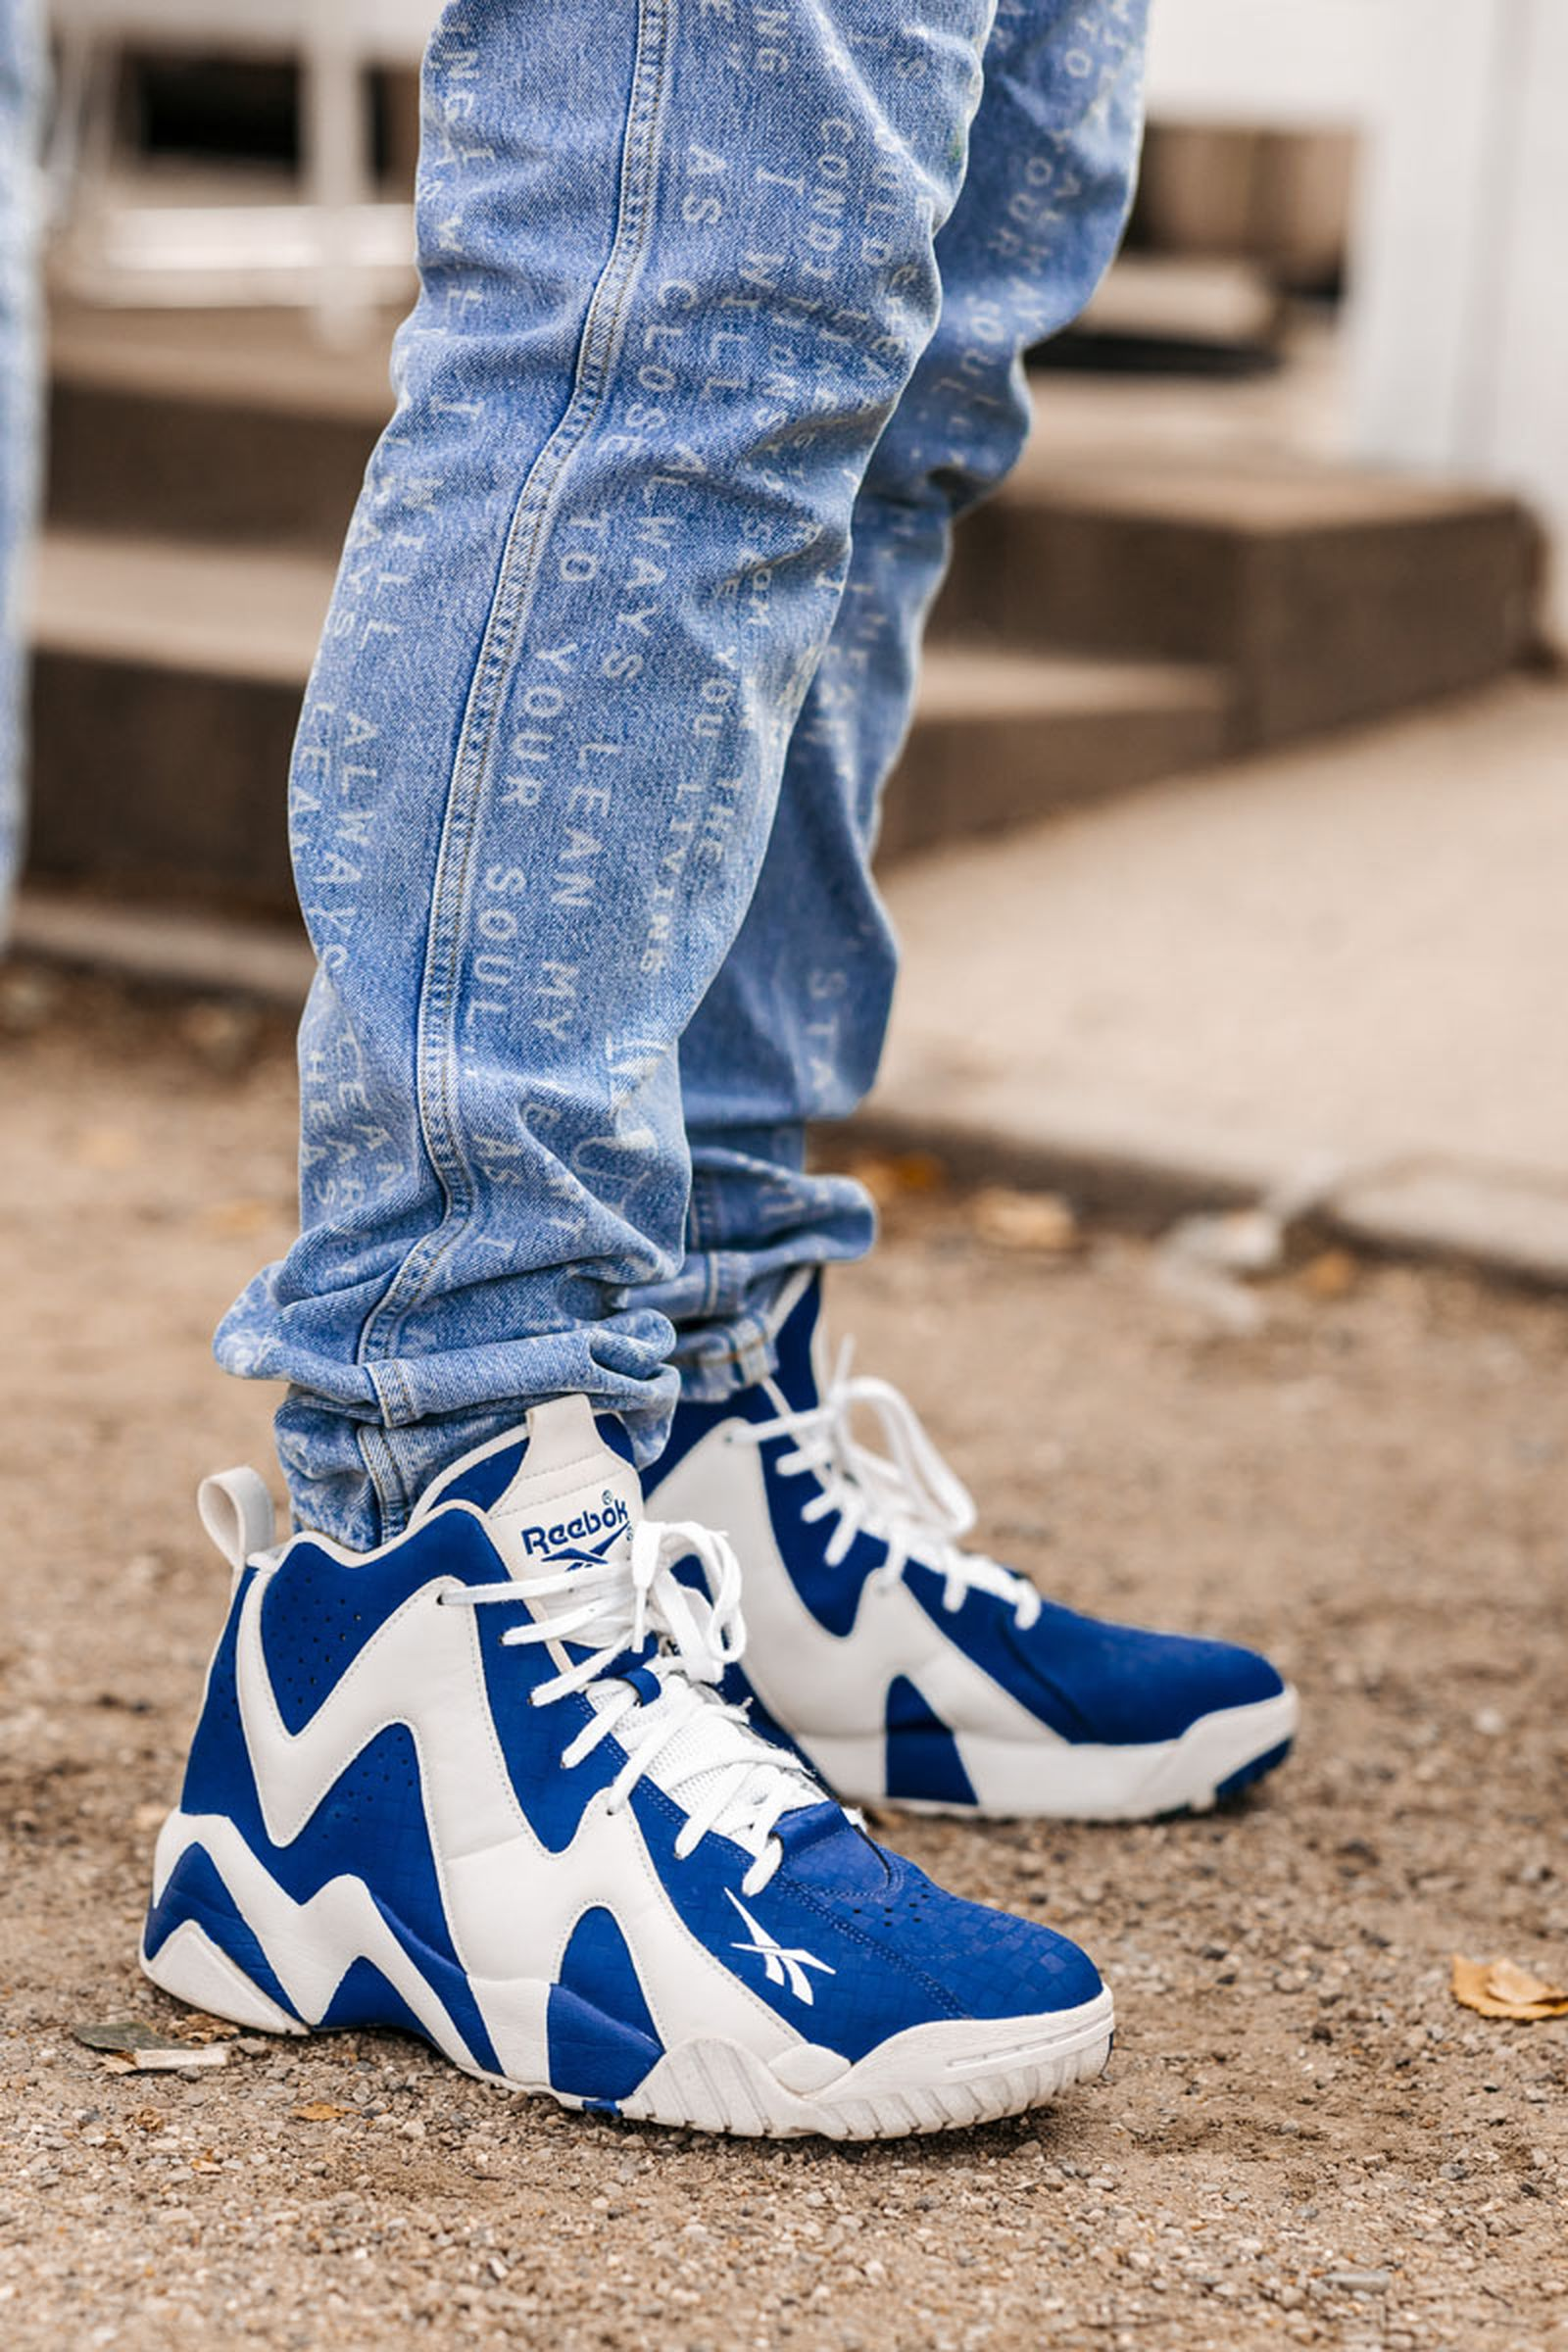 MSS20 Copenhagen StreetStyle Sneakers 16 Copenhagen Fashion Week SS20 New Balance adida